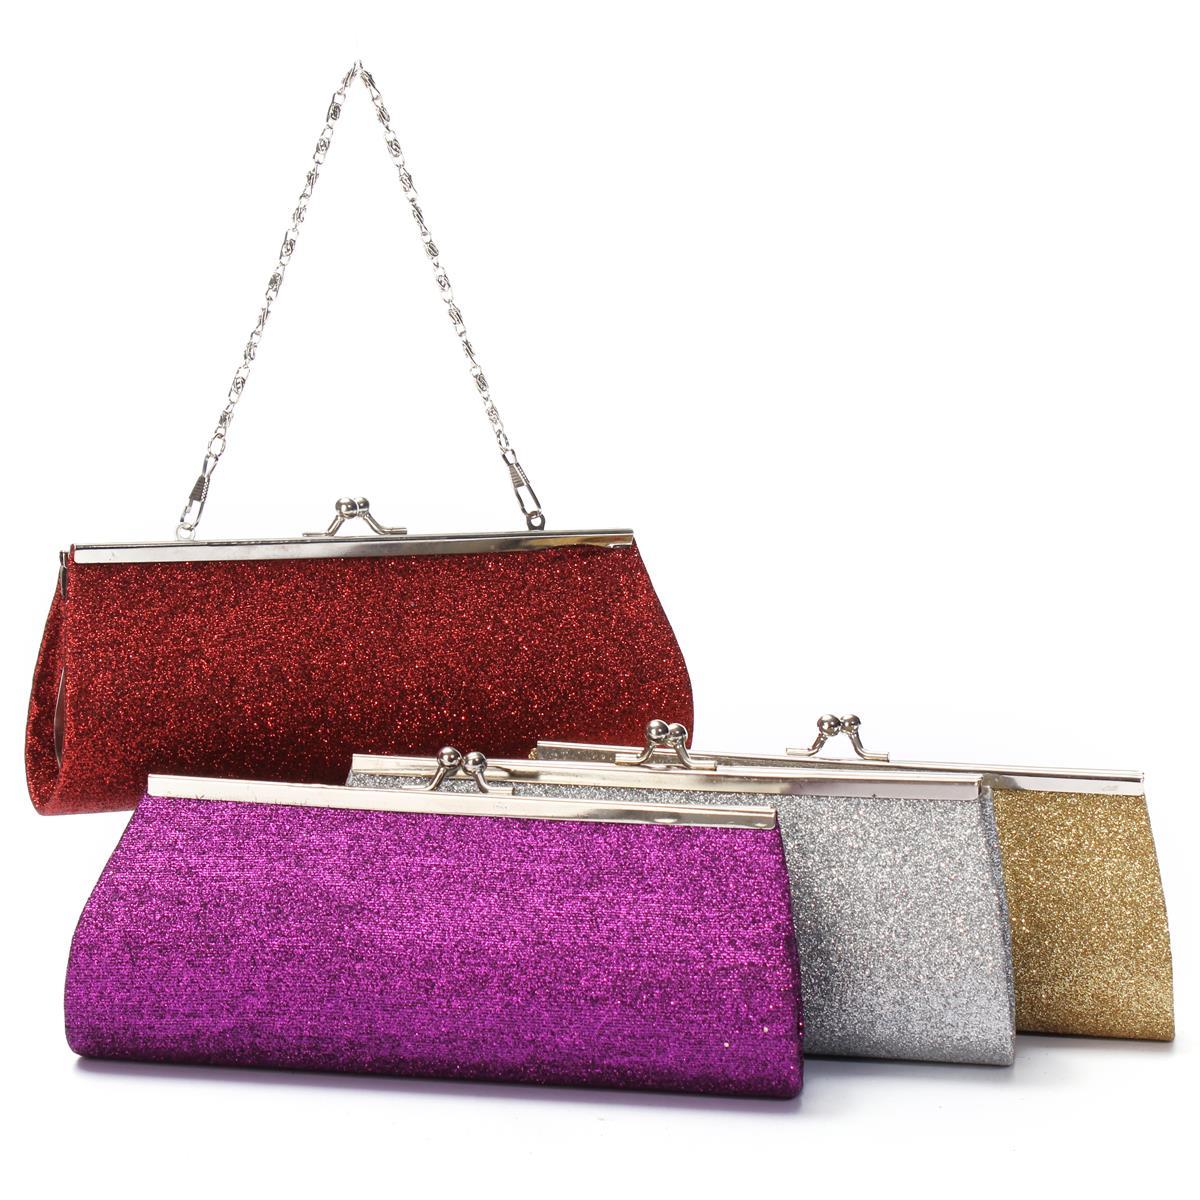 2015 Fashion Small Long Evening Bag Ladies Glitter Shoulder Chain Bag Purse Handbag Wedding Dinner Package Girls Clutch Bags New(China (Mainland))